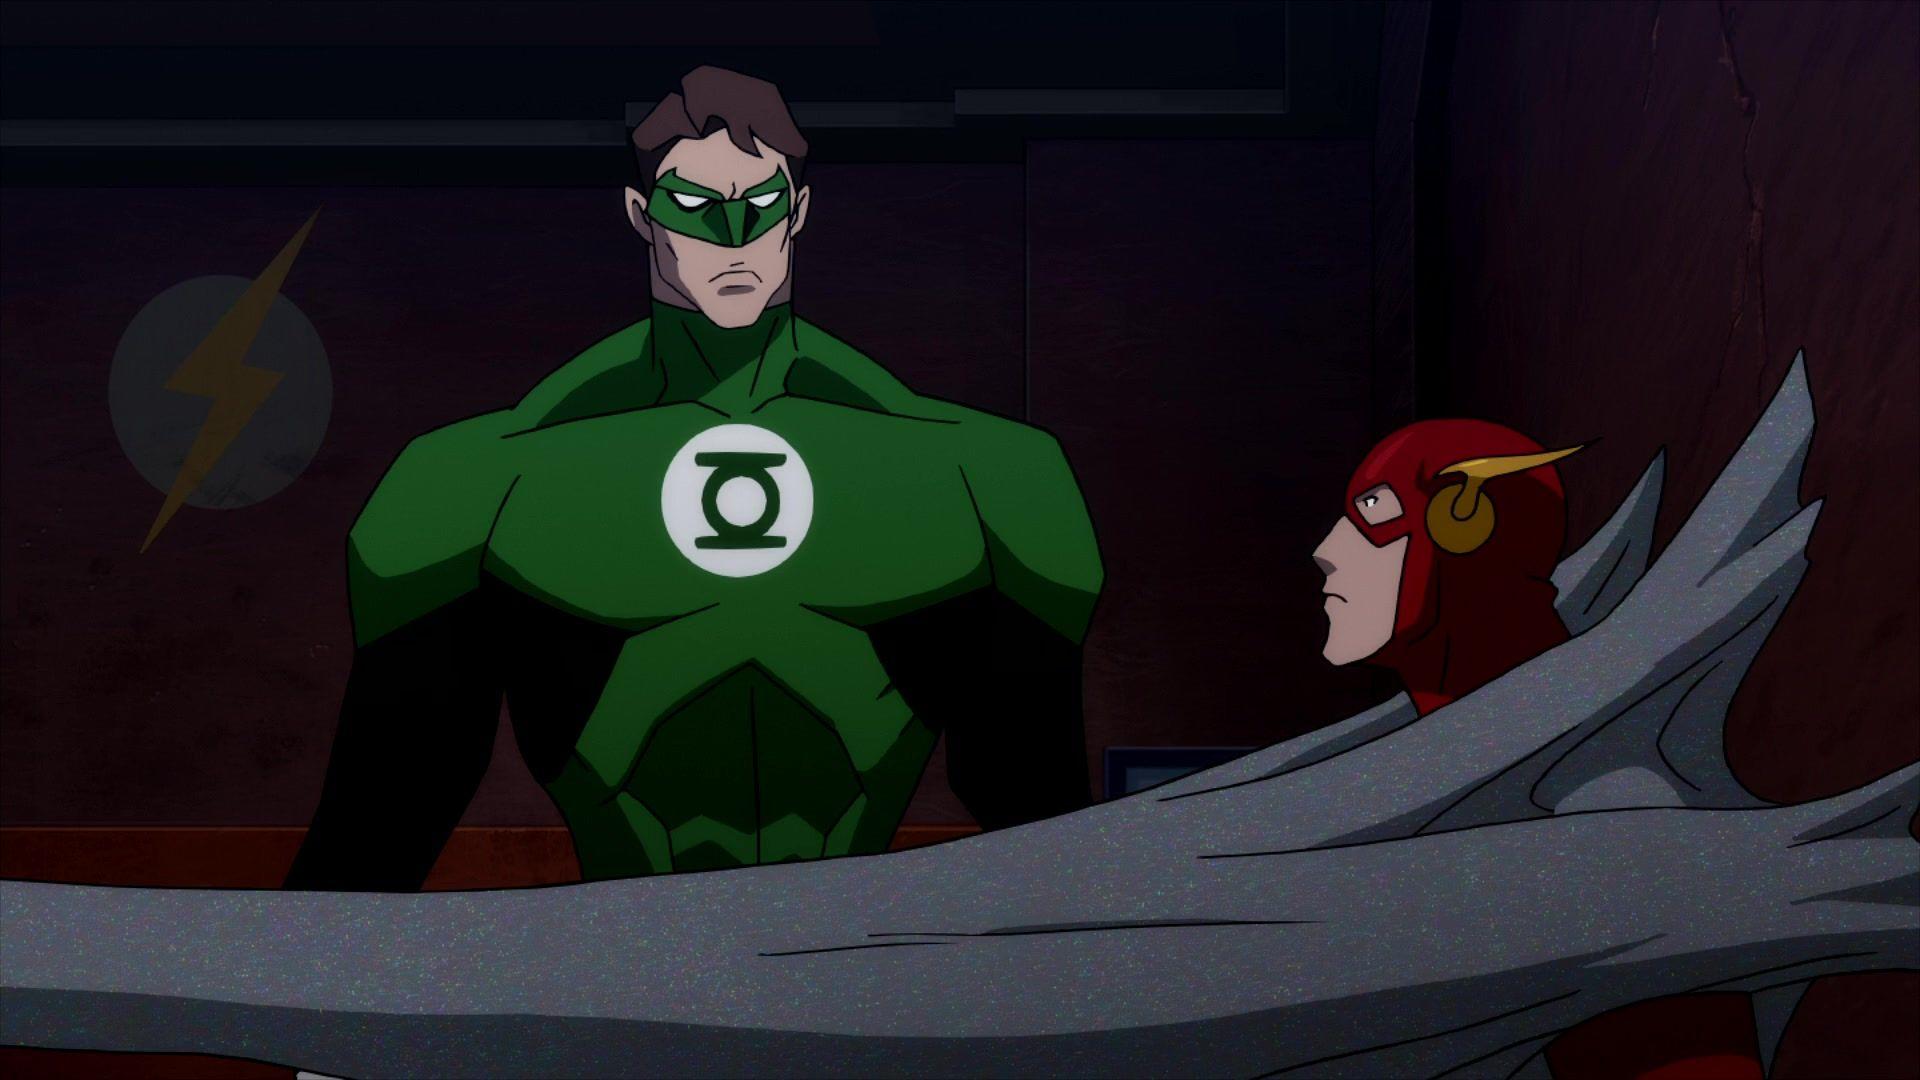 Justice League The Flashpoint Paradox 2013 Flash Point Paradox Green Lantern Hal Jordan Comics